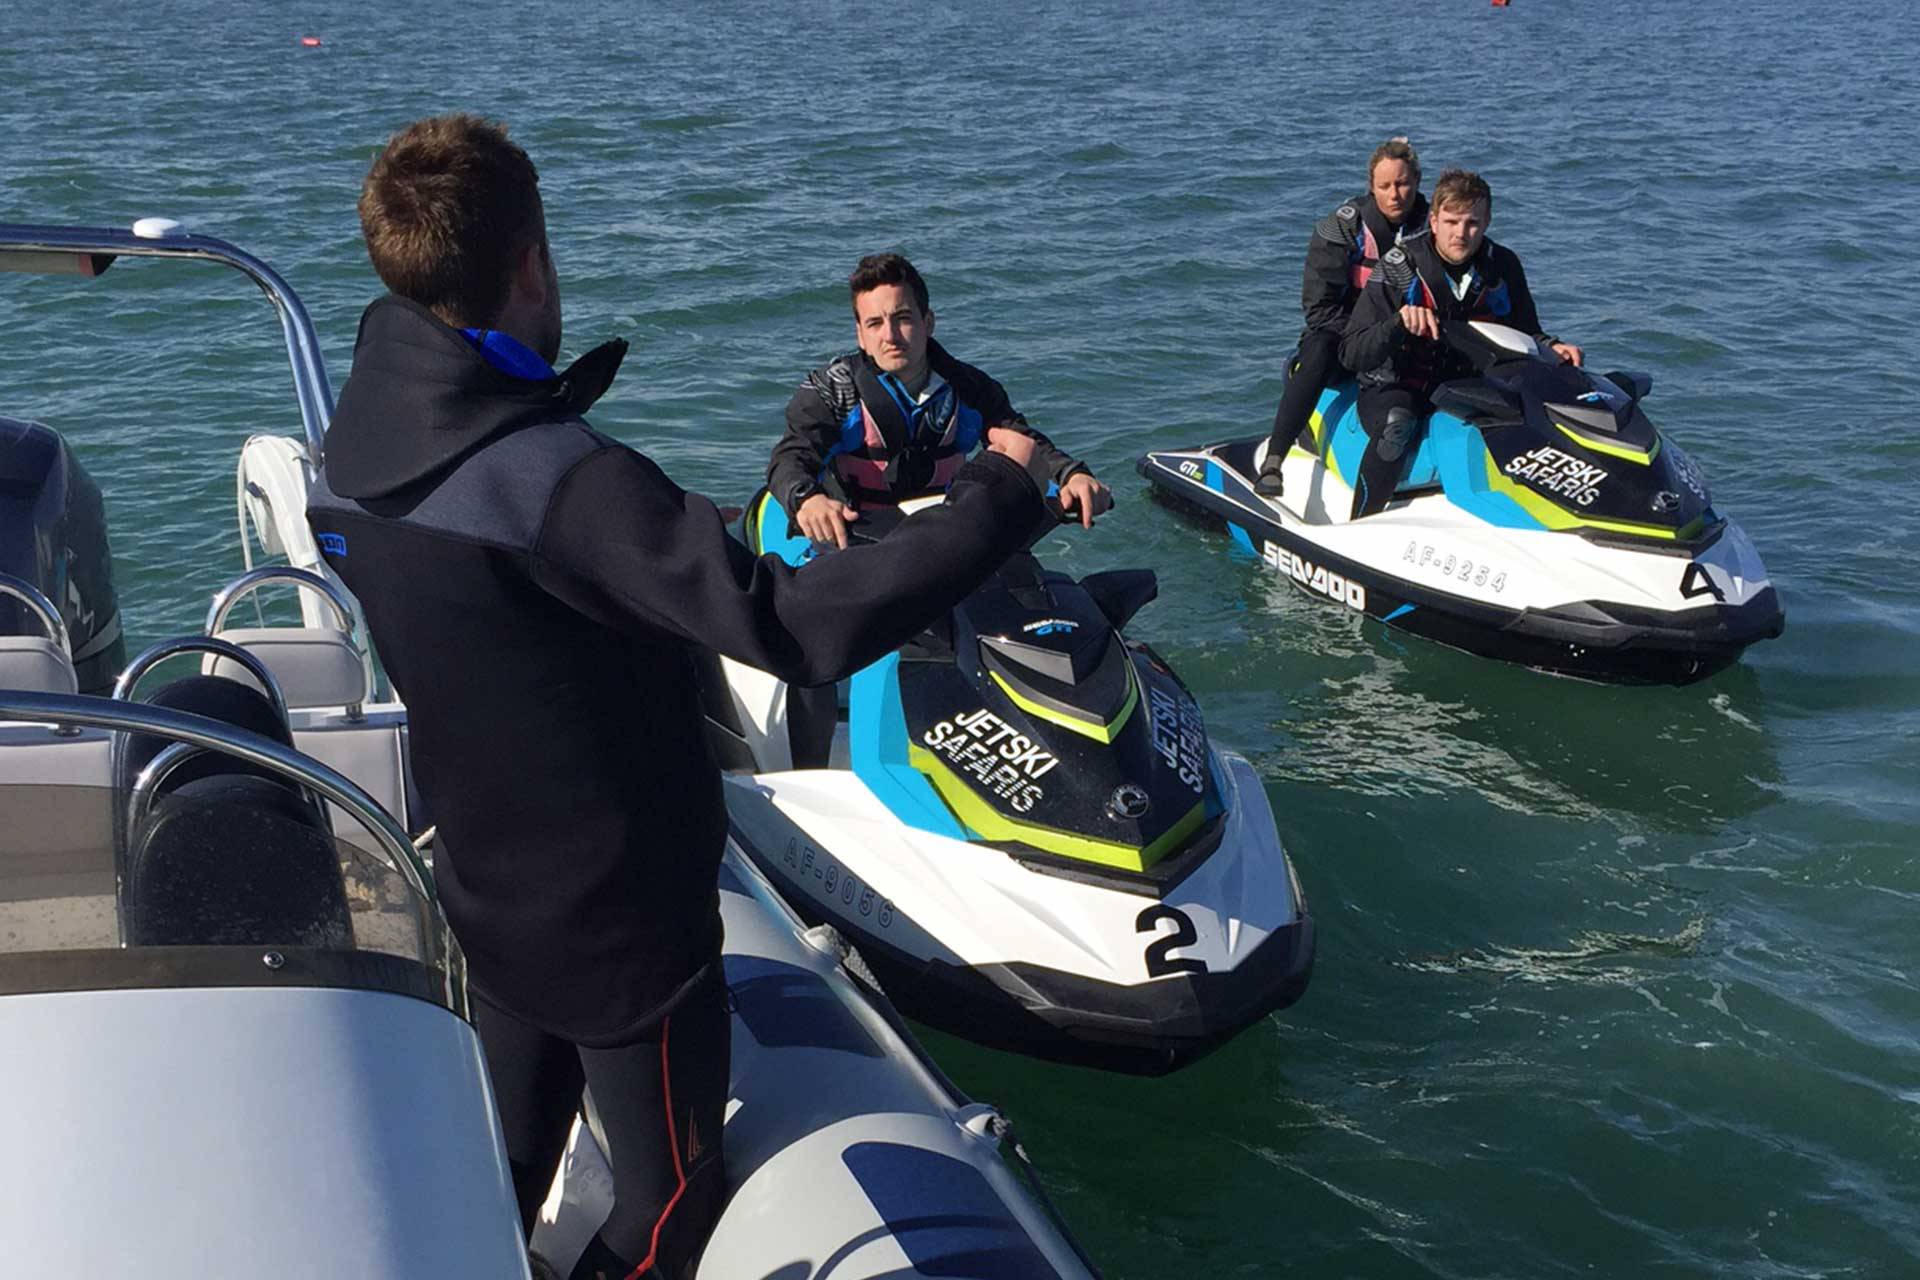 Jetski Training from aboard a Powerboat